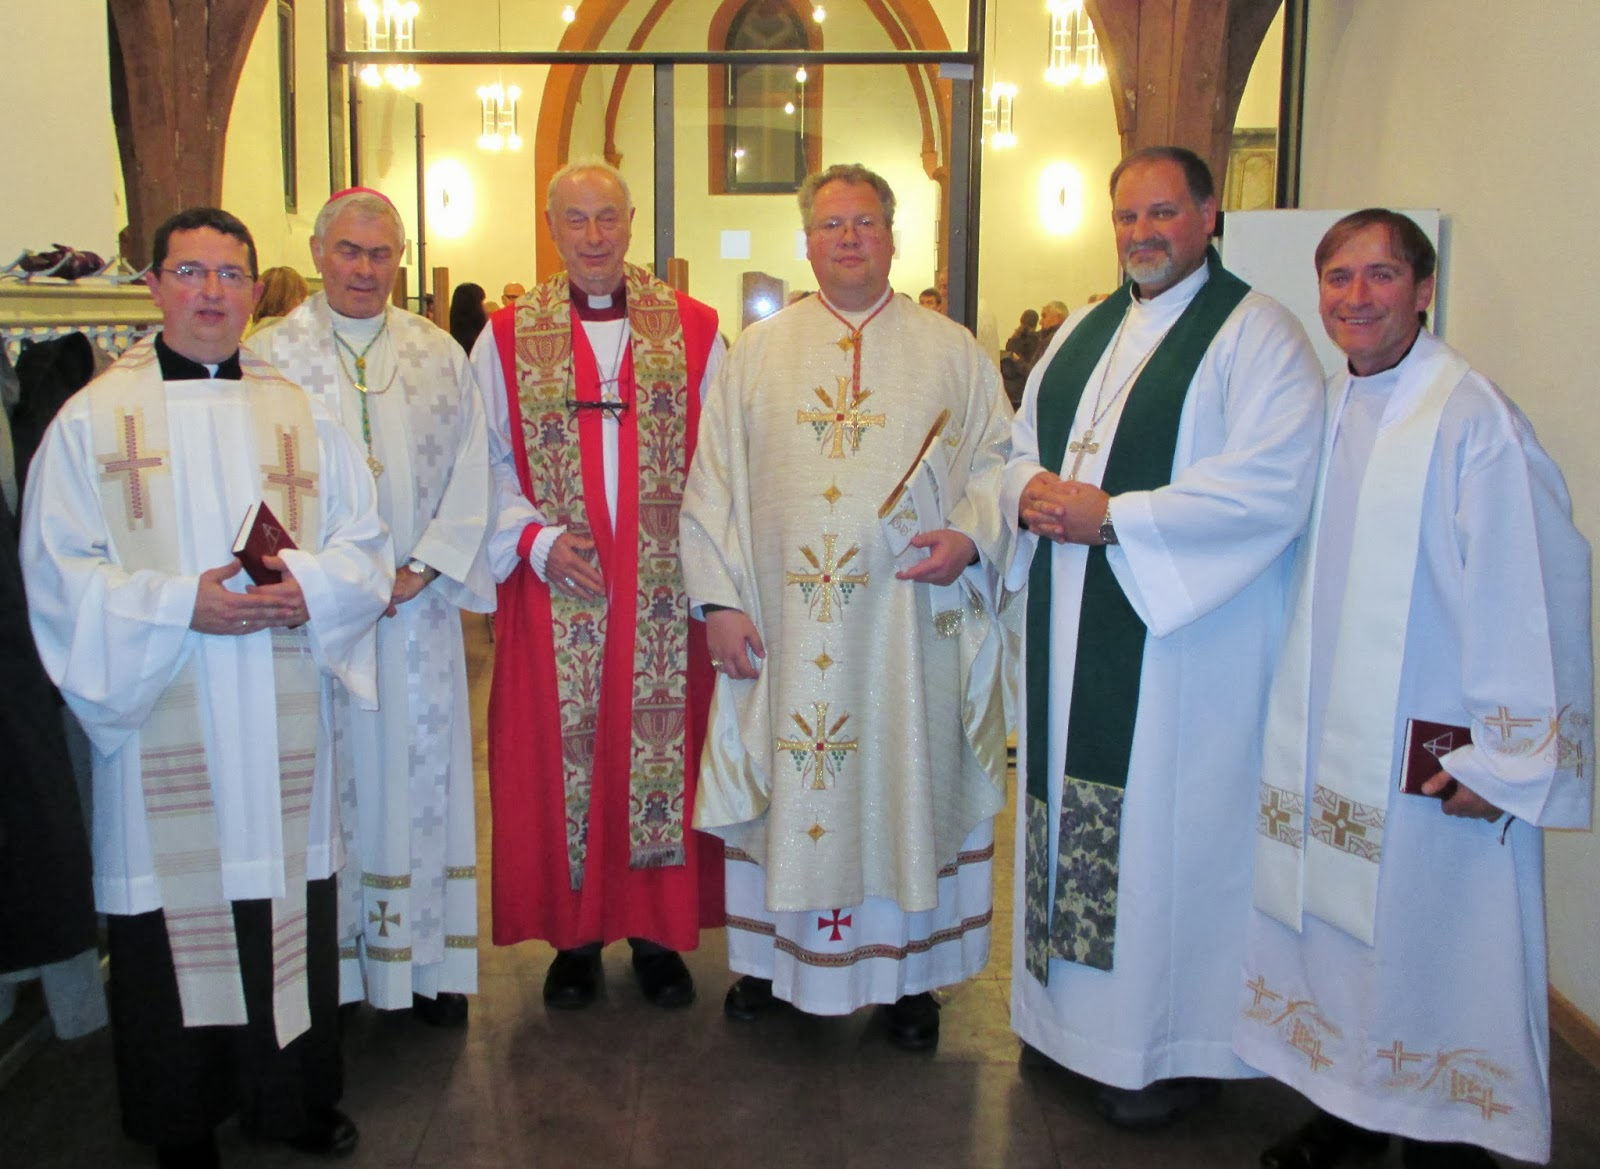 Anglikanische Kirche in Deutschland e.V. / REK: HOHER